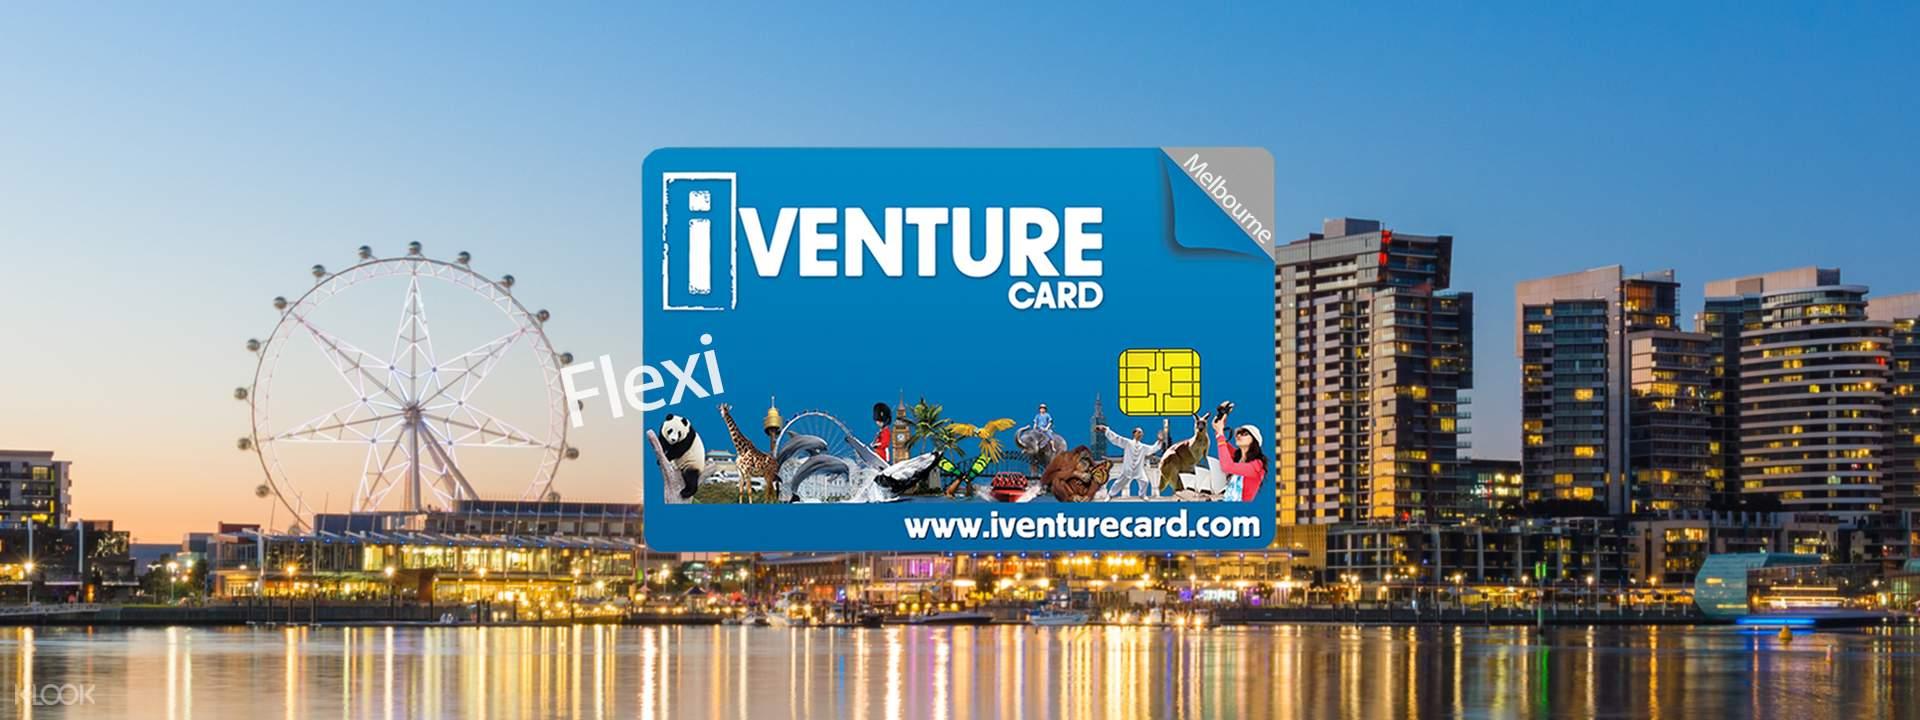 iVenture Flexi Attractions Pass Melbourne, Australia - Klook